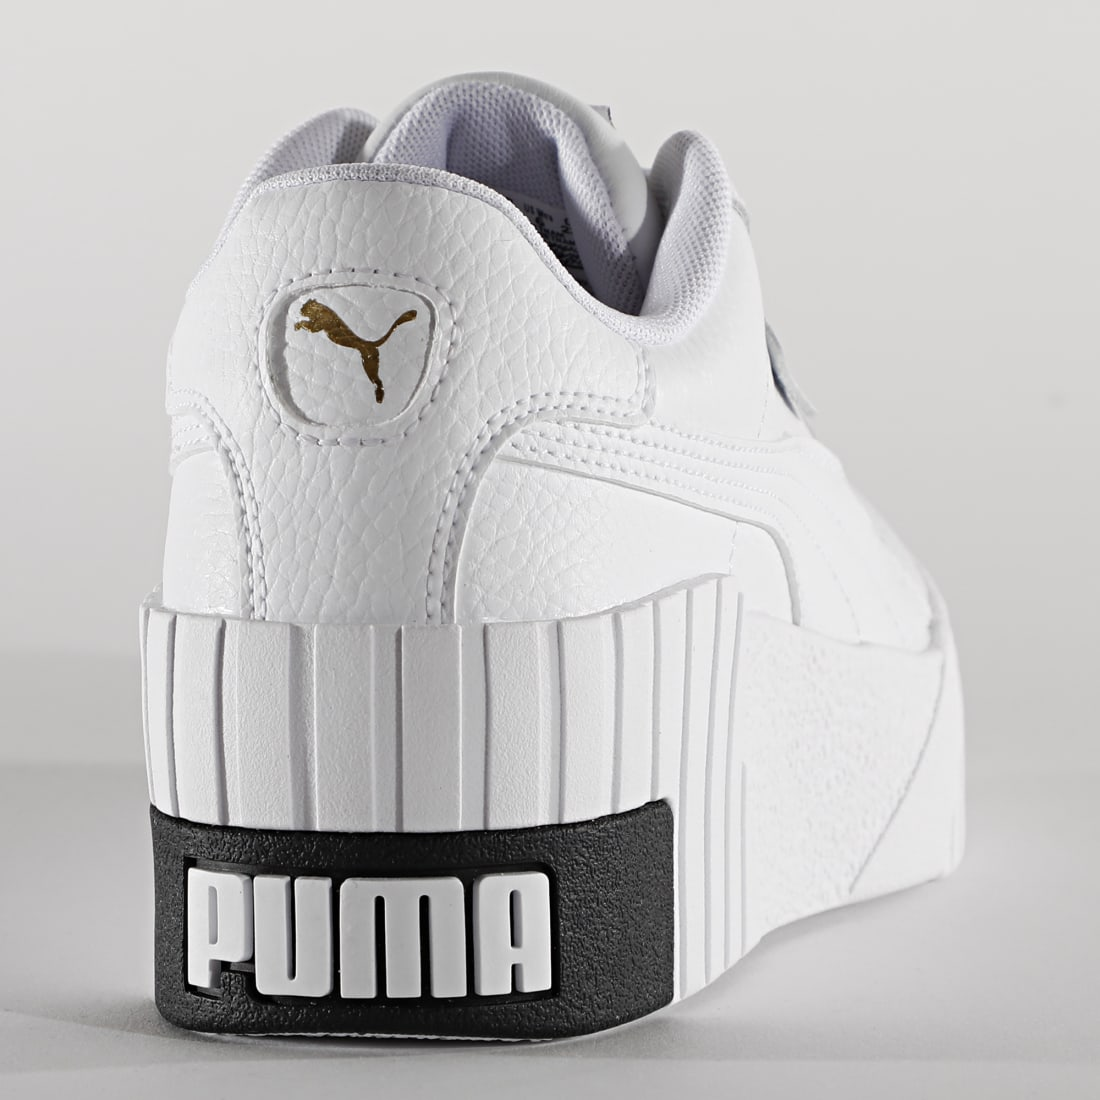 Puma Baskets Femme Cali Wedge 373438 Puma White Puma Black